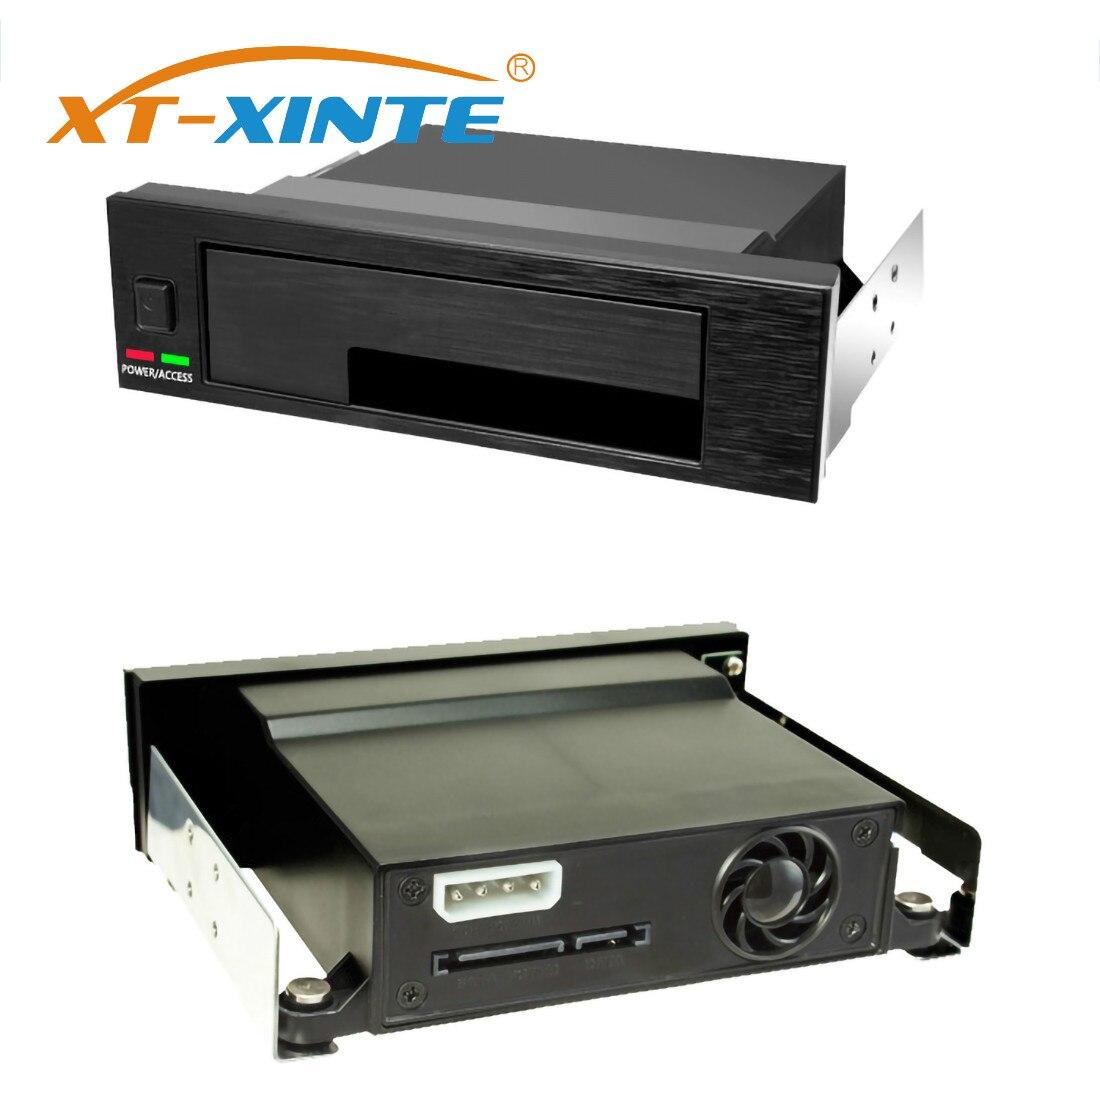 XT-XINTE HDD Storage Box Internal Single Bay Tray-Less Mobile Rack Enclosure LED Indicator Hot-swap for 2 5 3 5 Inch SATA